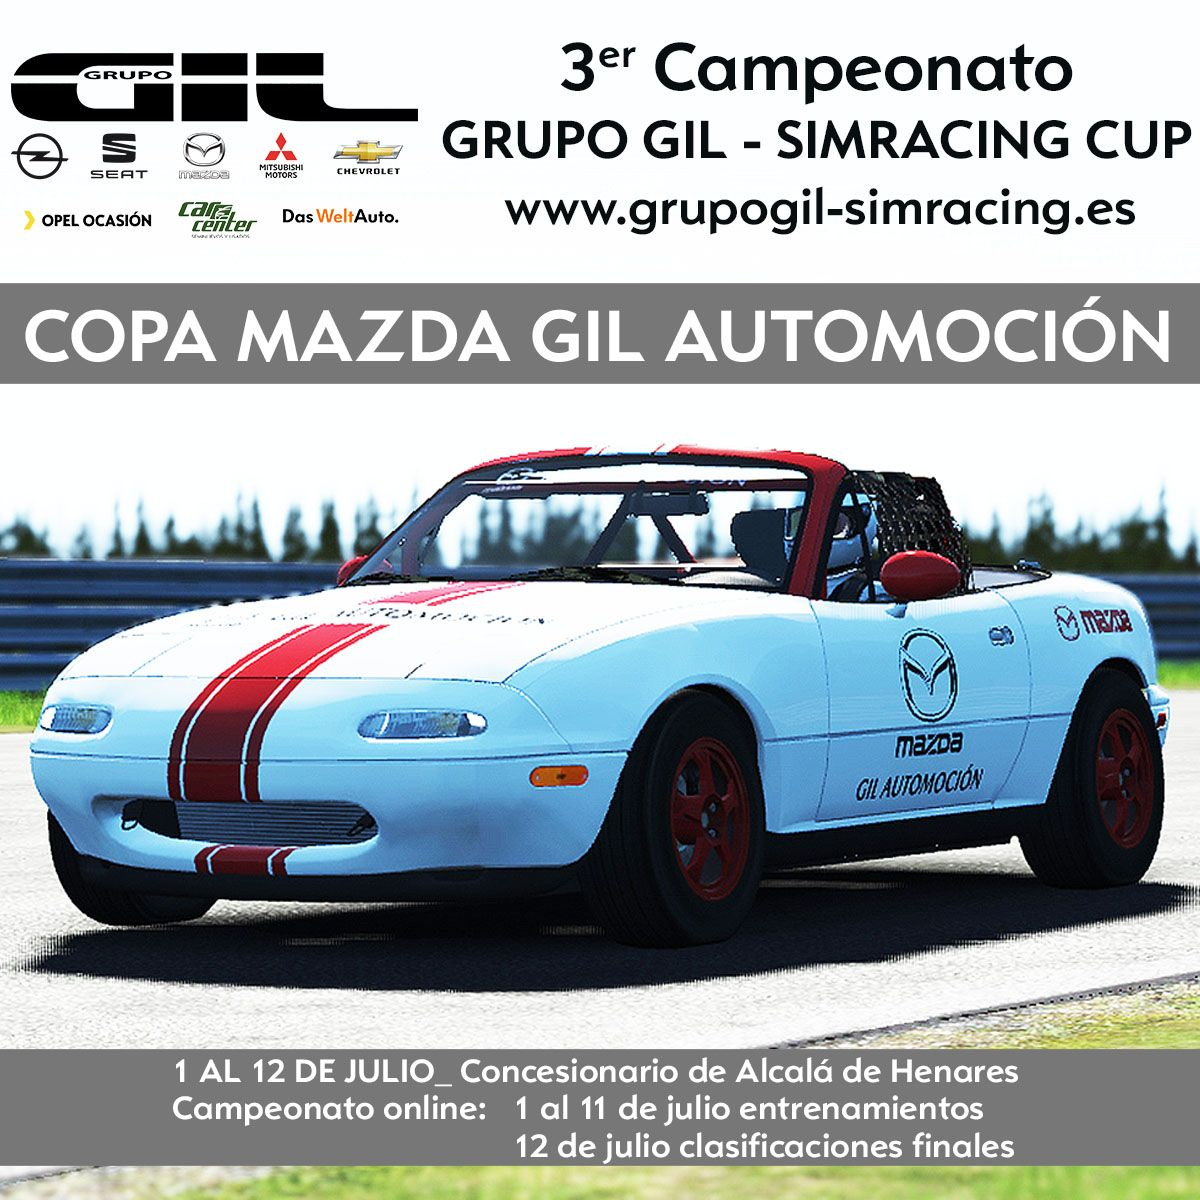 3ª RONDA DEL CAMPEONATO GRUPO GIL - SIMRACING CUP